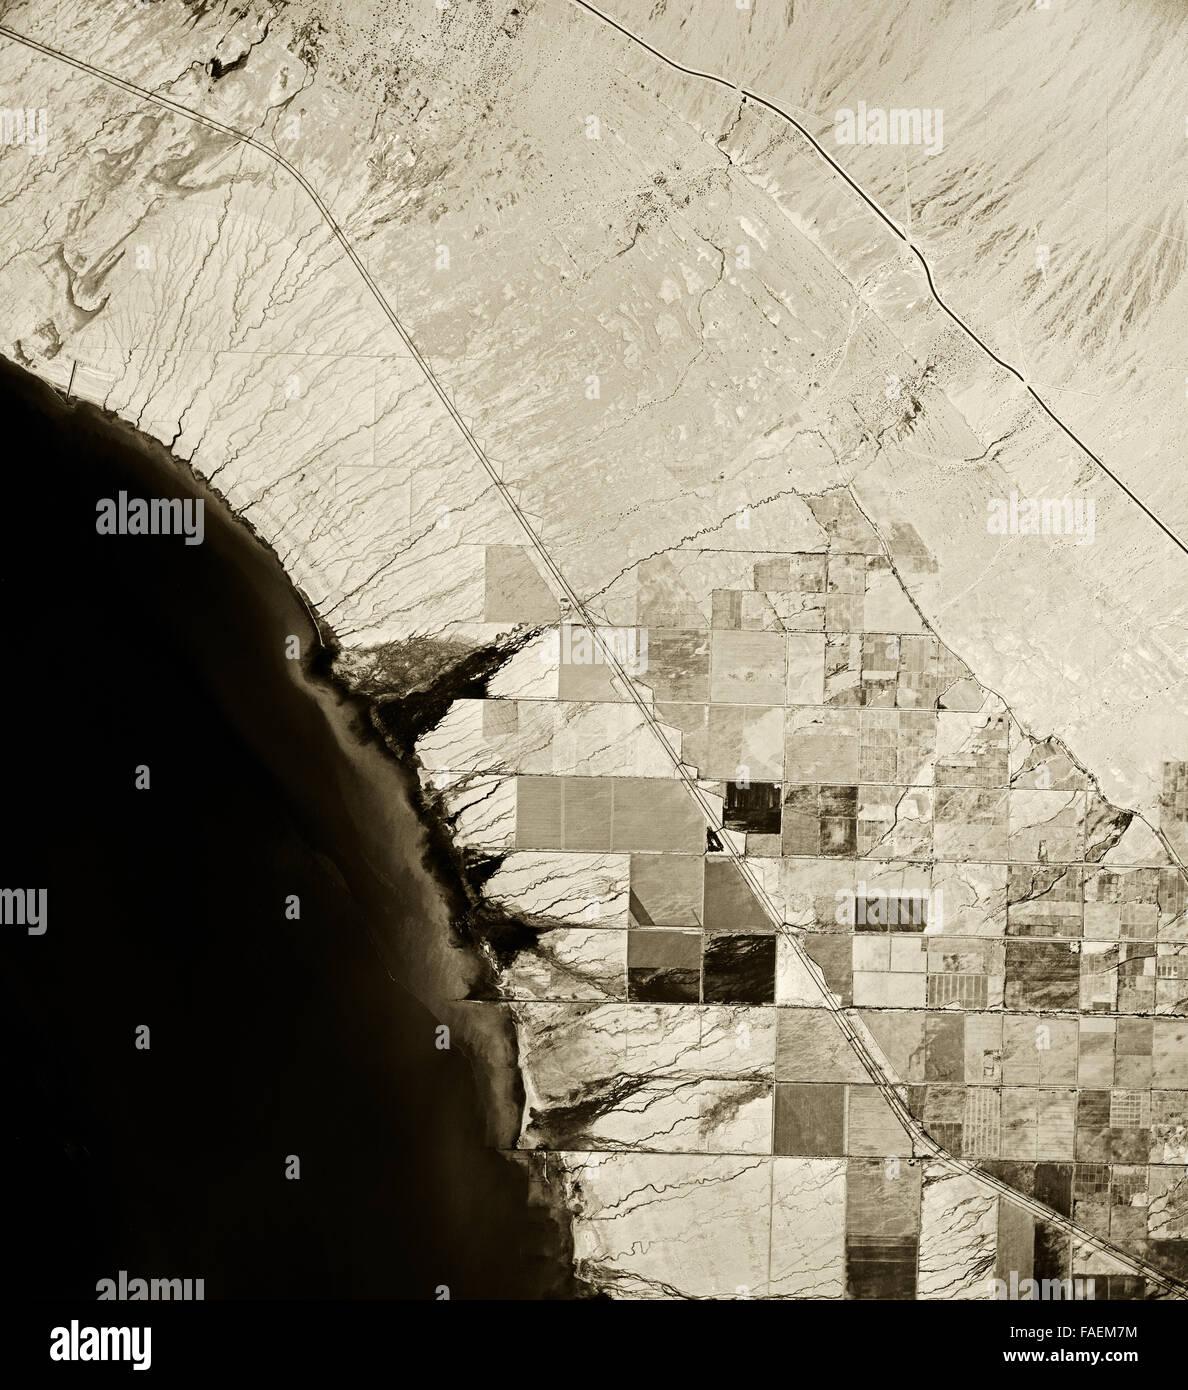 historical infrared aerial photograph of Salton Sea, California,1954 - Stock Image